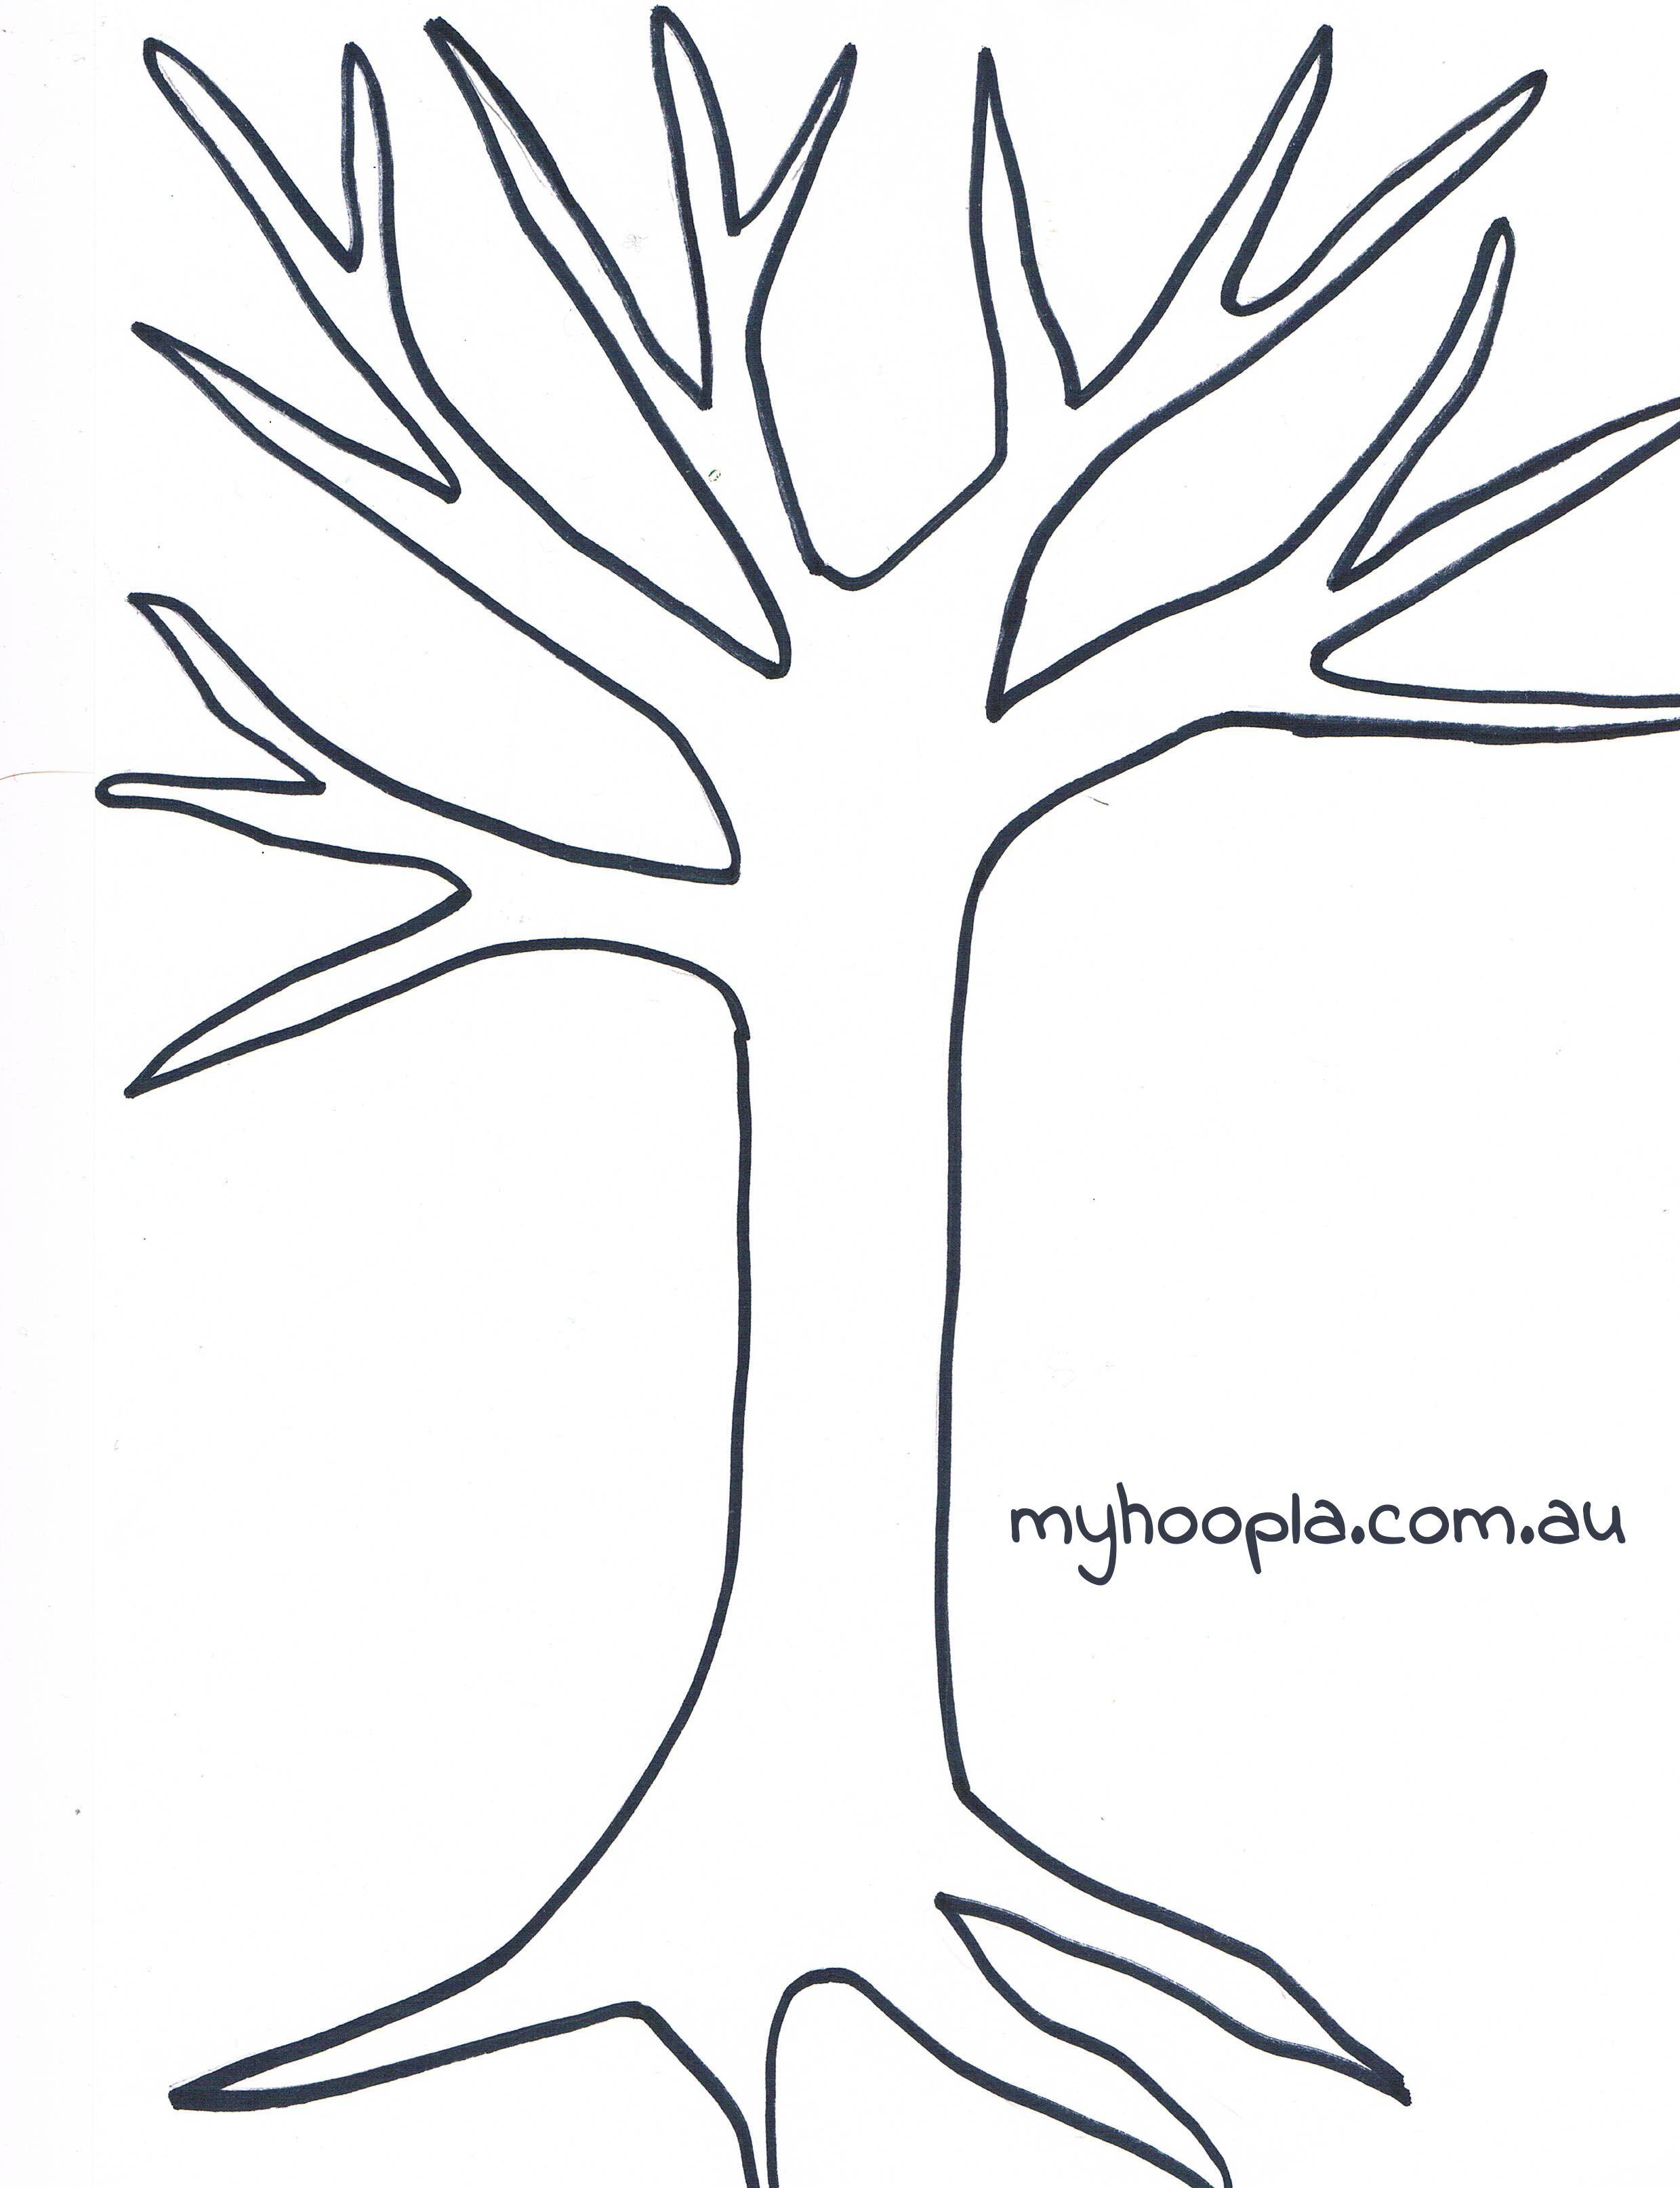 Preschool Tree Template F95ada8c0c8d36b Baf707a96be3